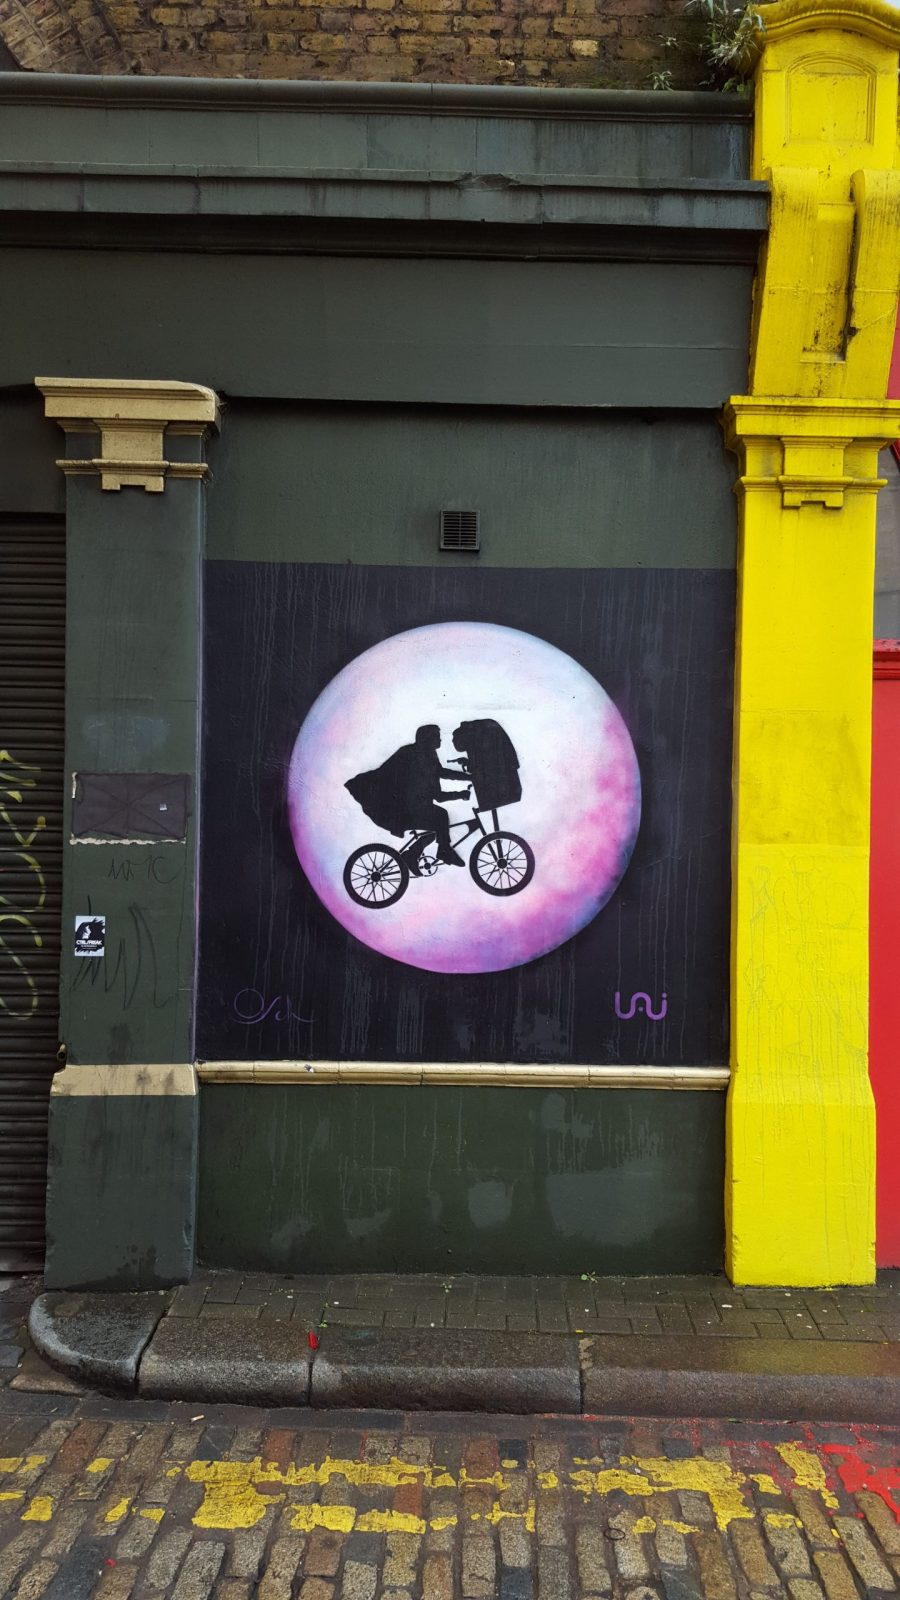 New Street Art in London: Alternative London Walking Tour Review 36